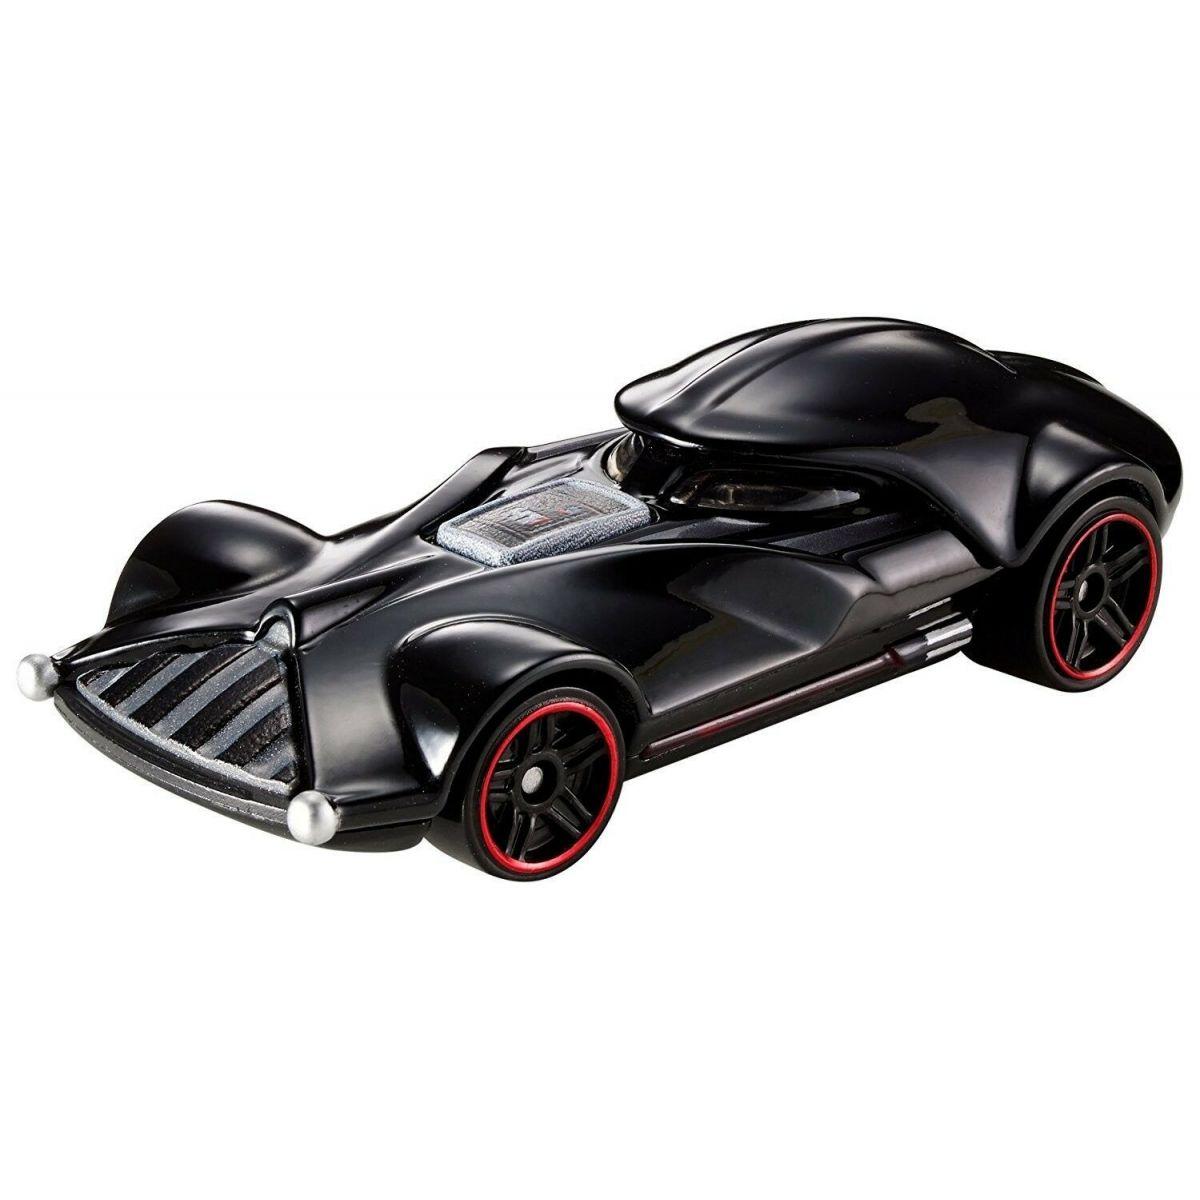 Mattel Hot Wheels tematické auto – Star Wars Darth Vader